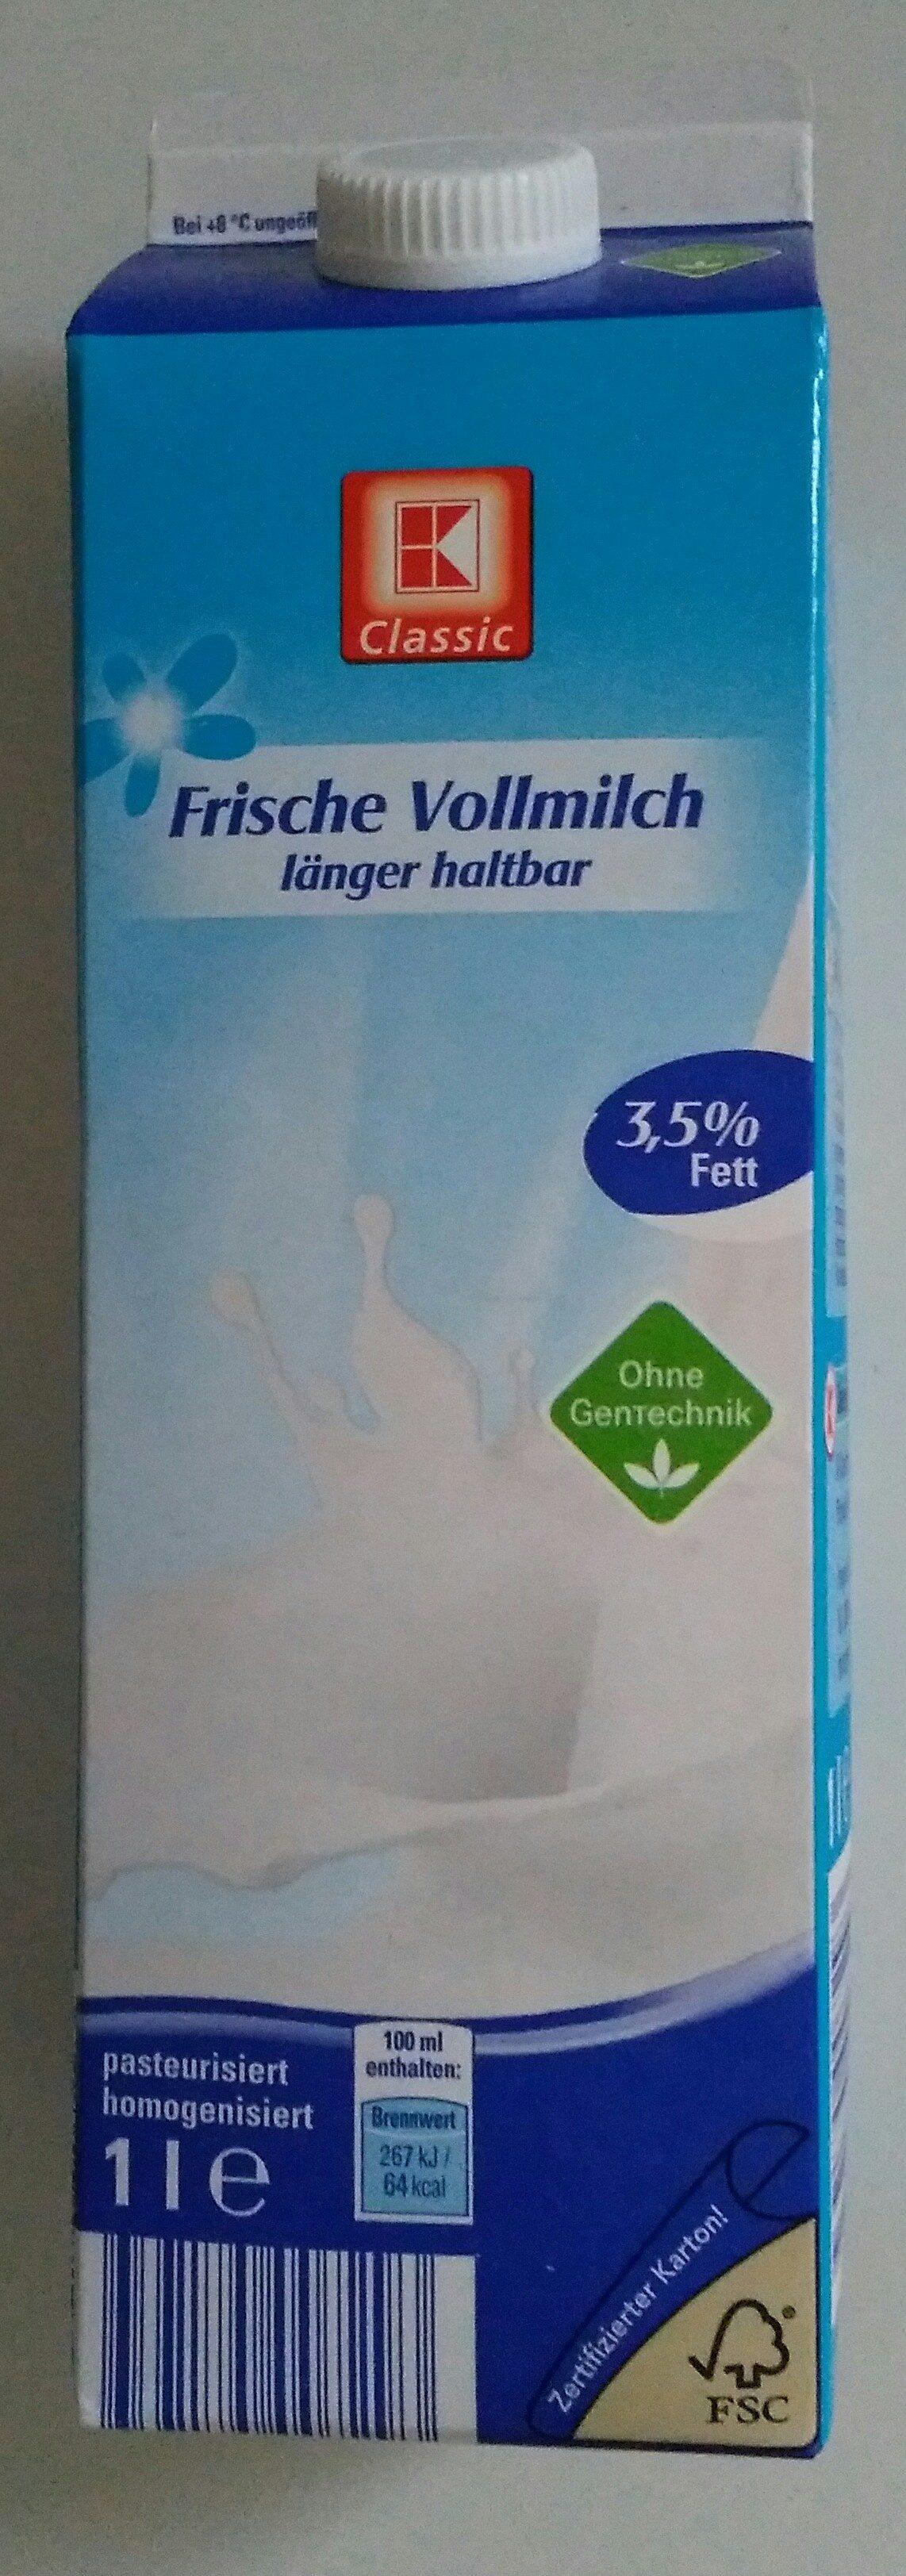 K Classic Frische Vollmilch 3,5% Fett - Product